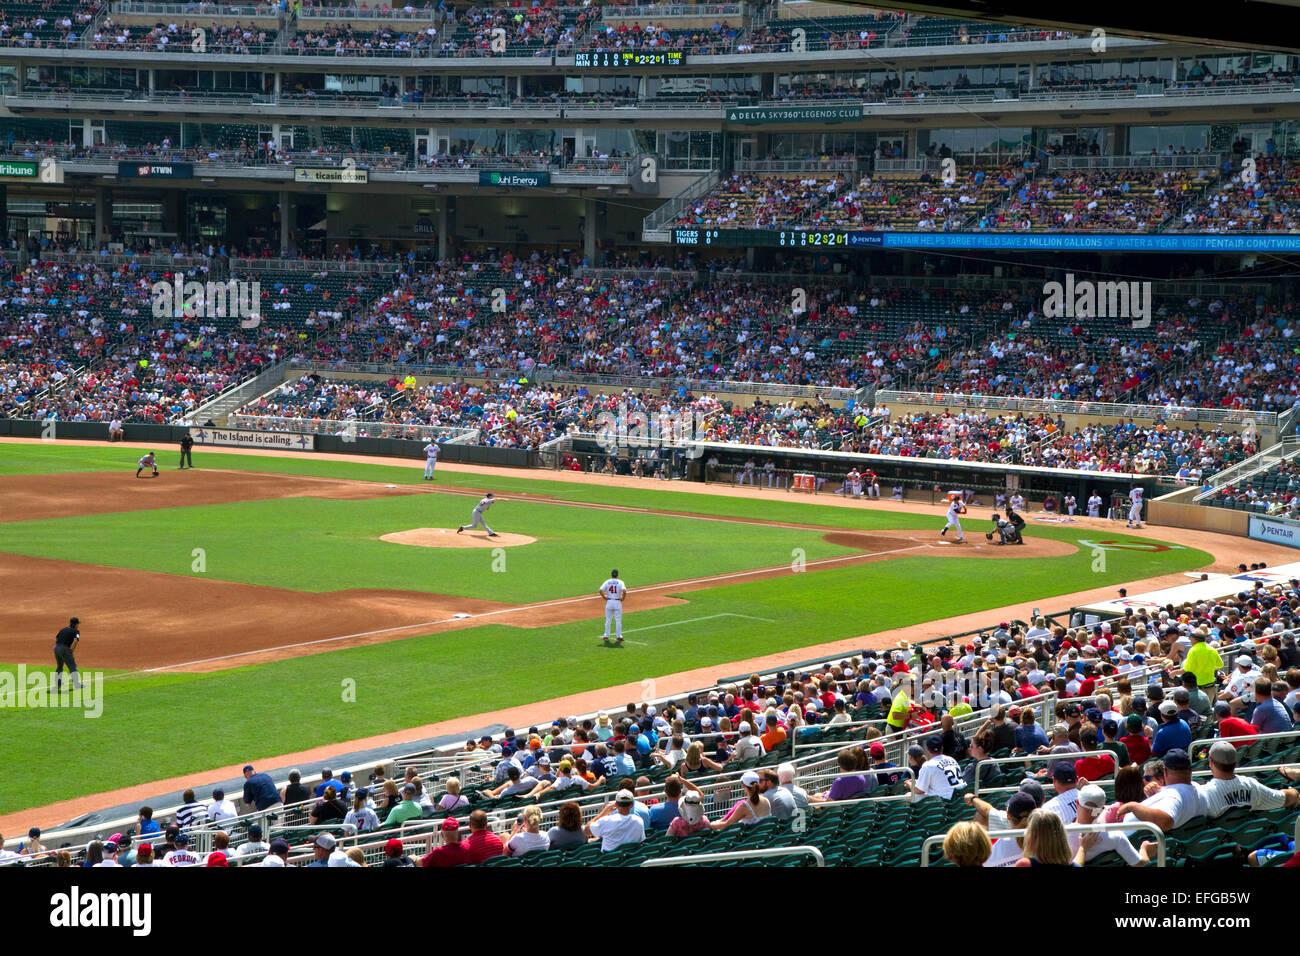 Der Baseball-Park am Zielfeld in Minneapolis, Minnesota, USA. Stockfoto